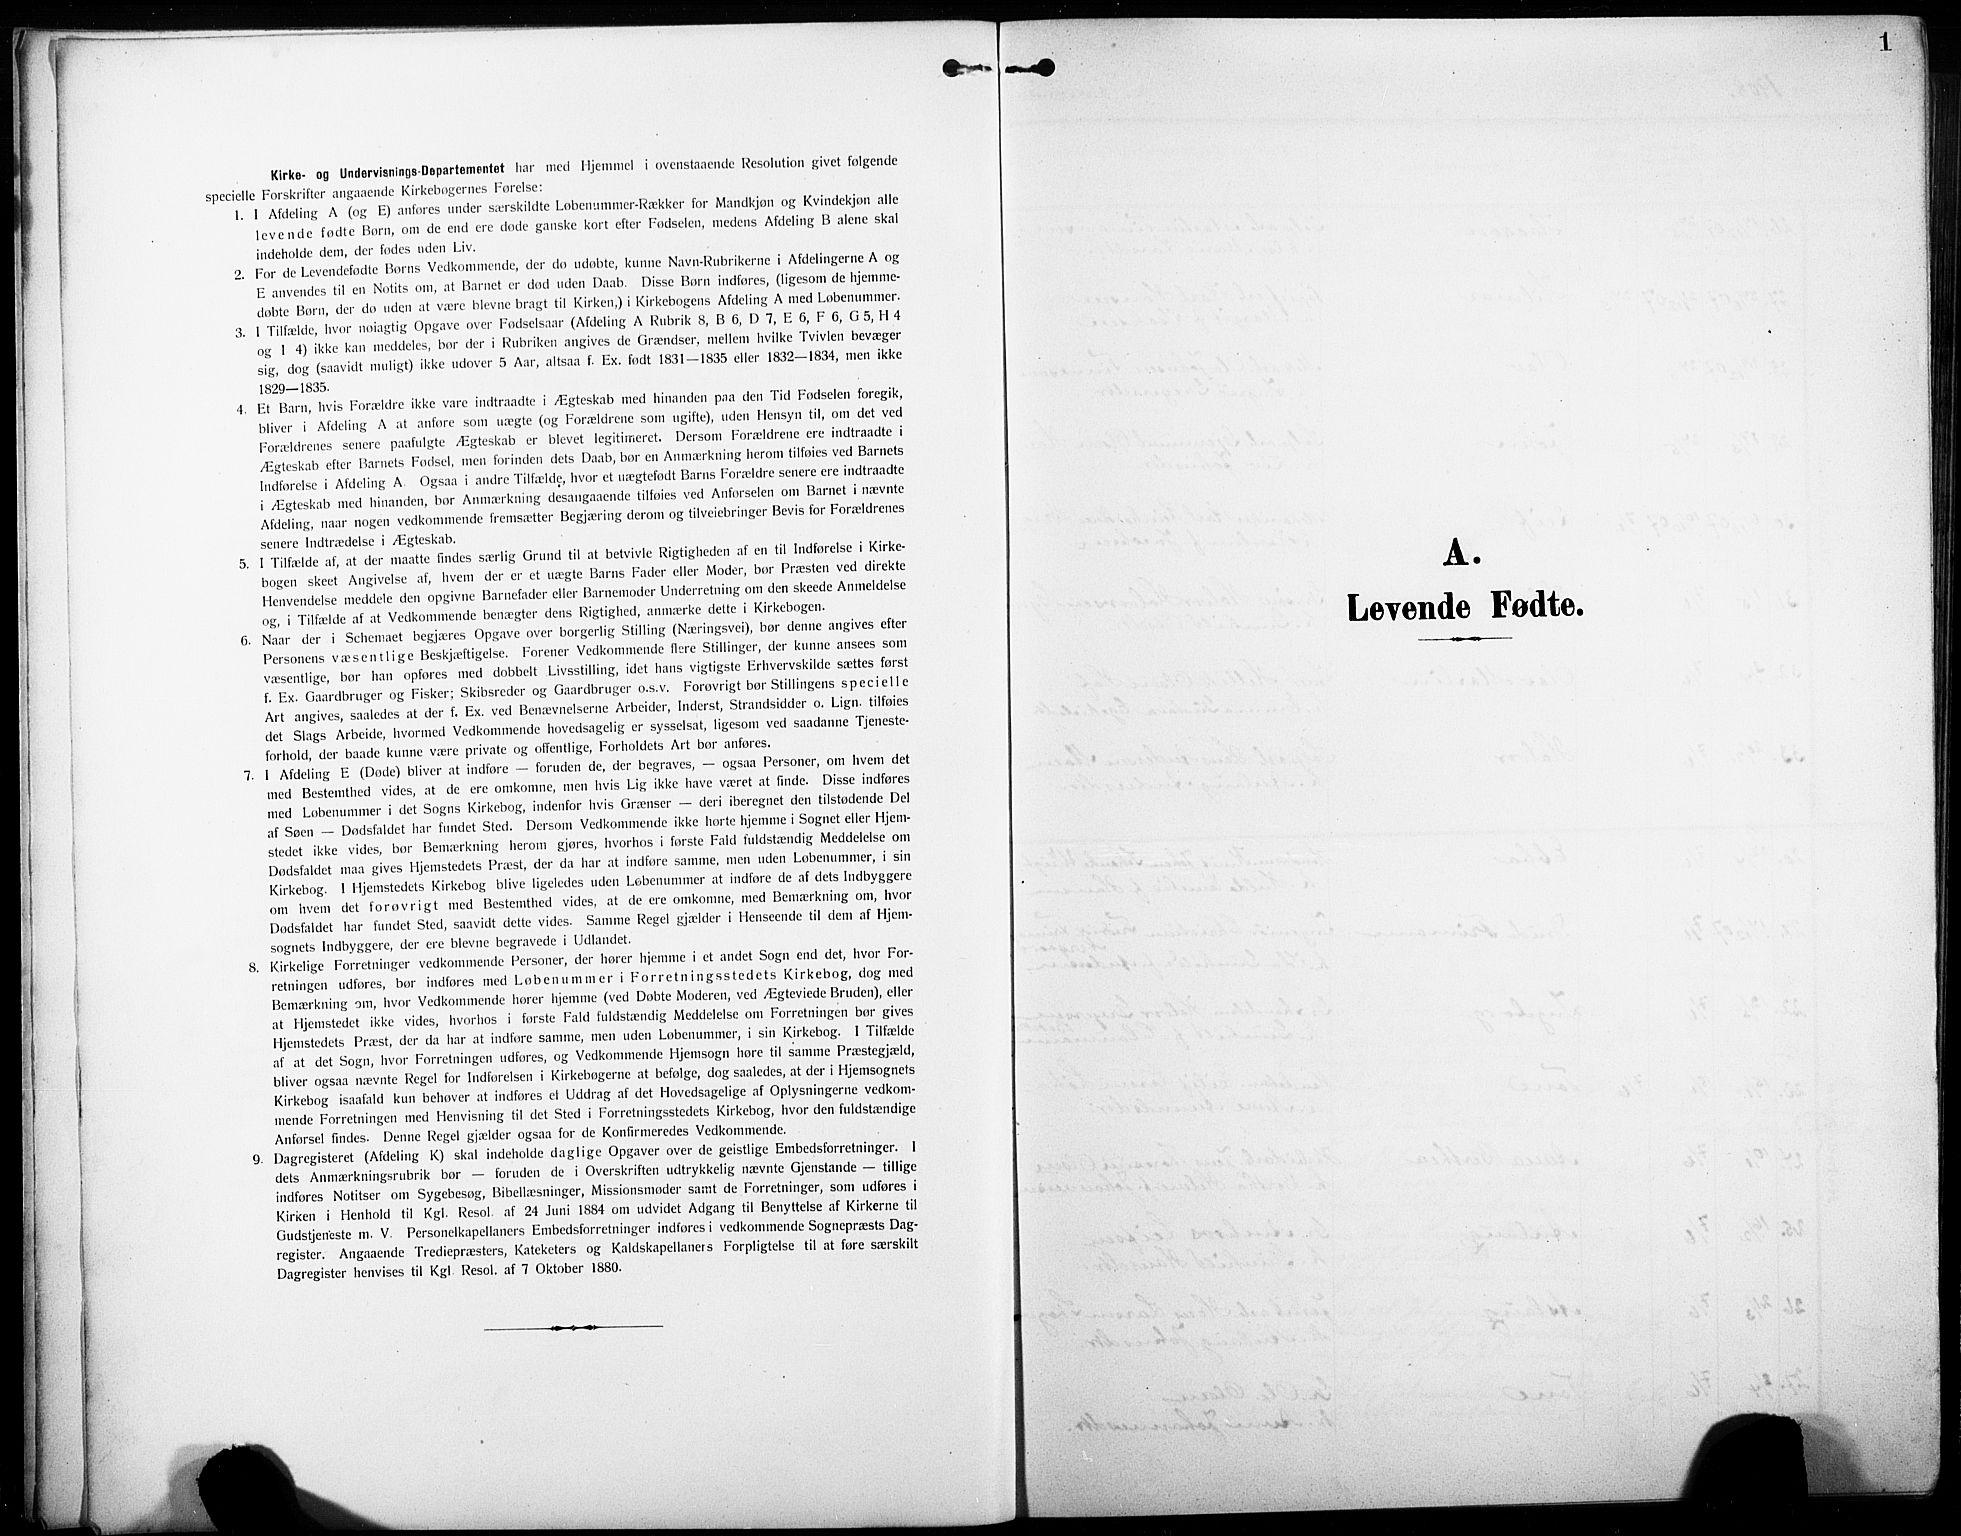 SAKO, Heddal kirkebøker, G/Ga/L0003: Klokkerbok nr. I 3, 1908-1932, s. 1